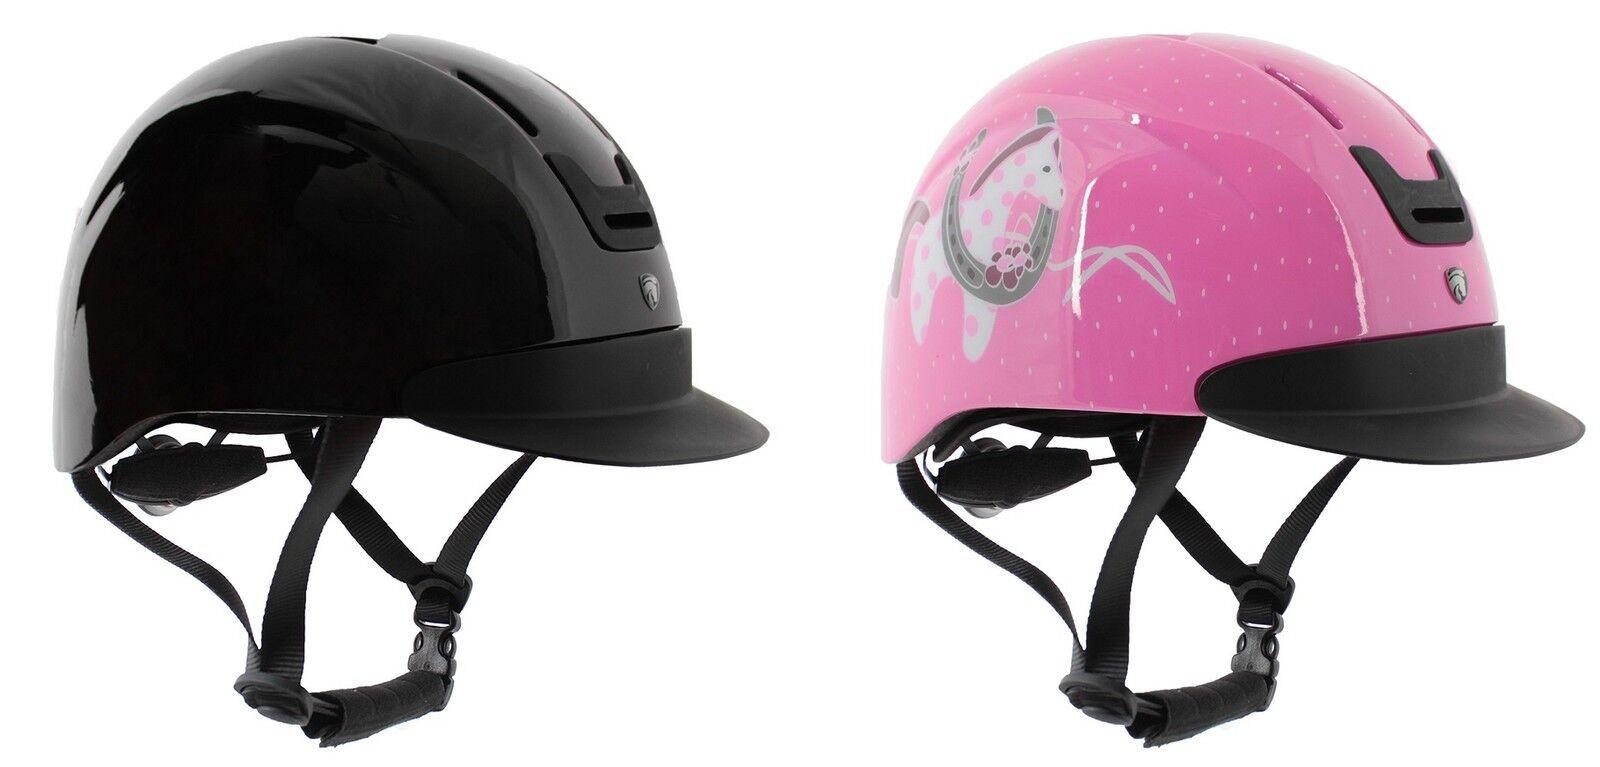 ADJUSTABLE Horse Riding Helmet Hat 48-57cm ALL COLOURS VG1 STANDARD